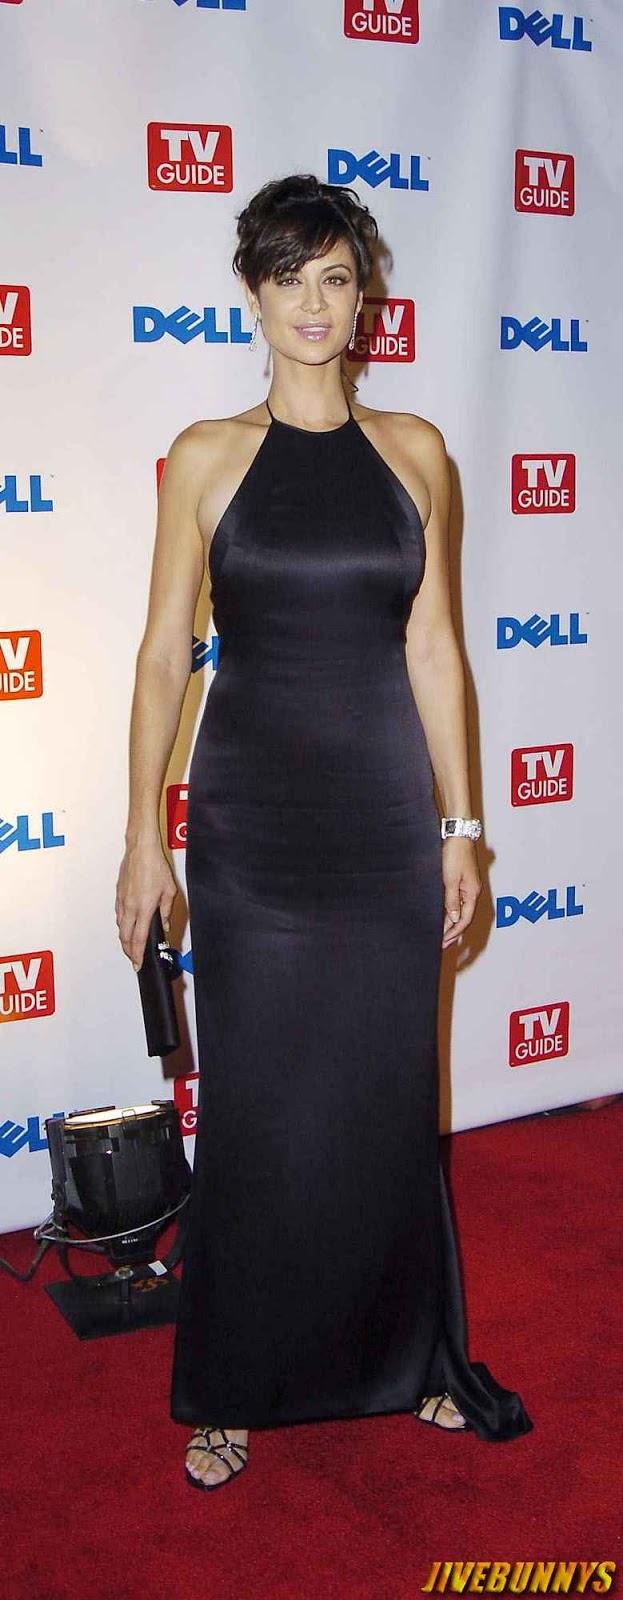 Jivebunnys Female Celebrity Picture Gallery: Catherine ... Jennifer Aniston Movies